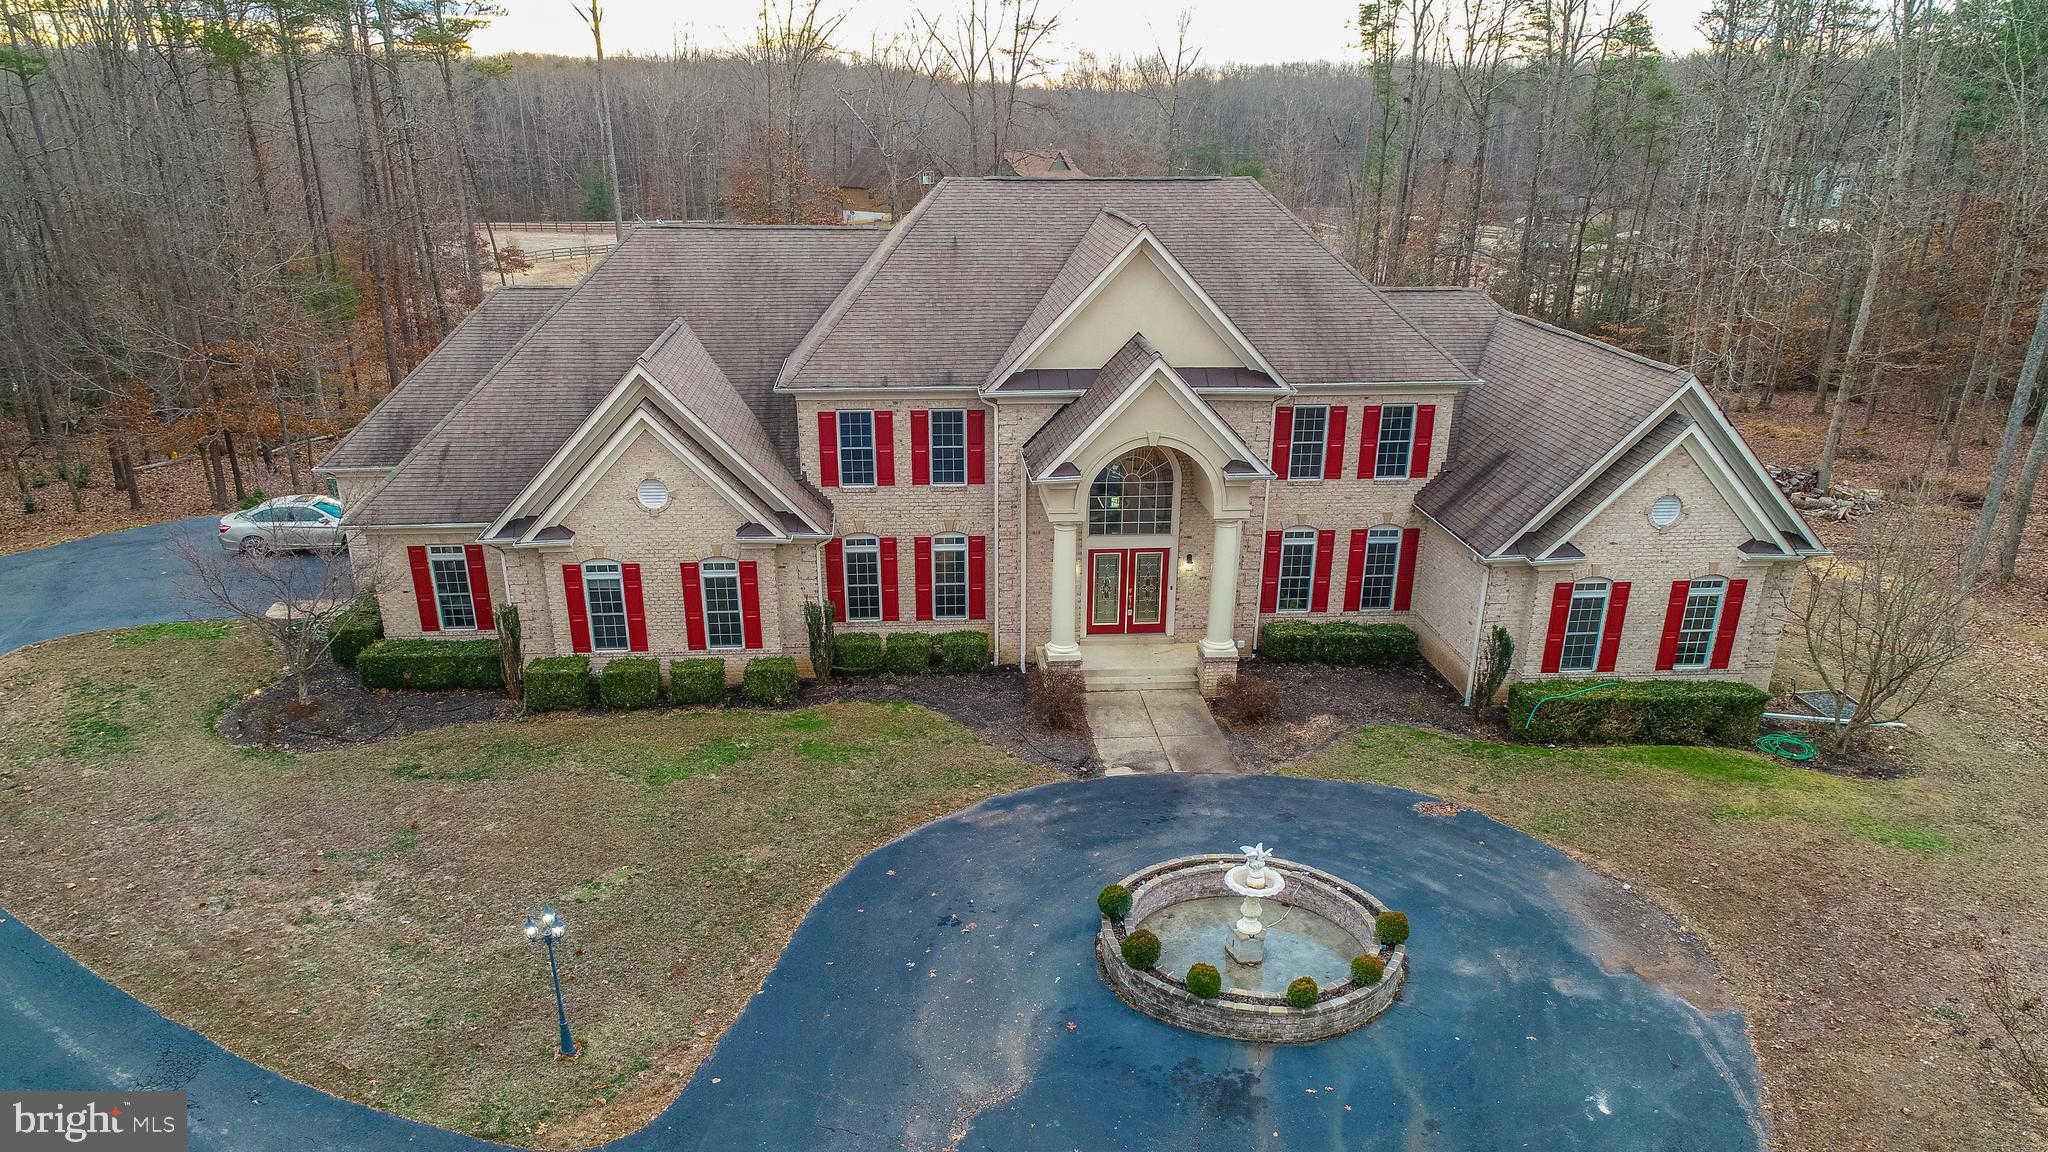 1585 Aquia Road, Midland, VA 22728 now has a new price of $899,000!